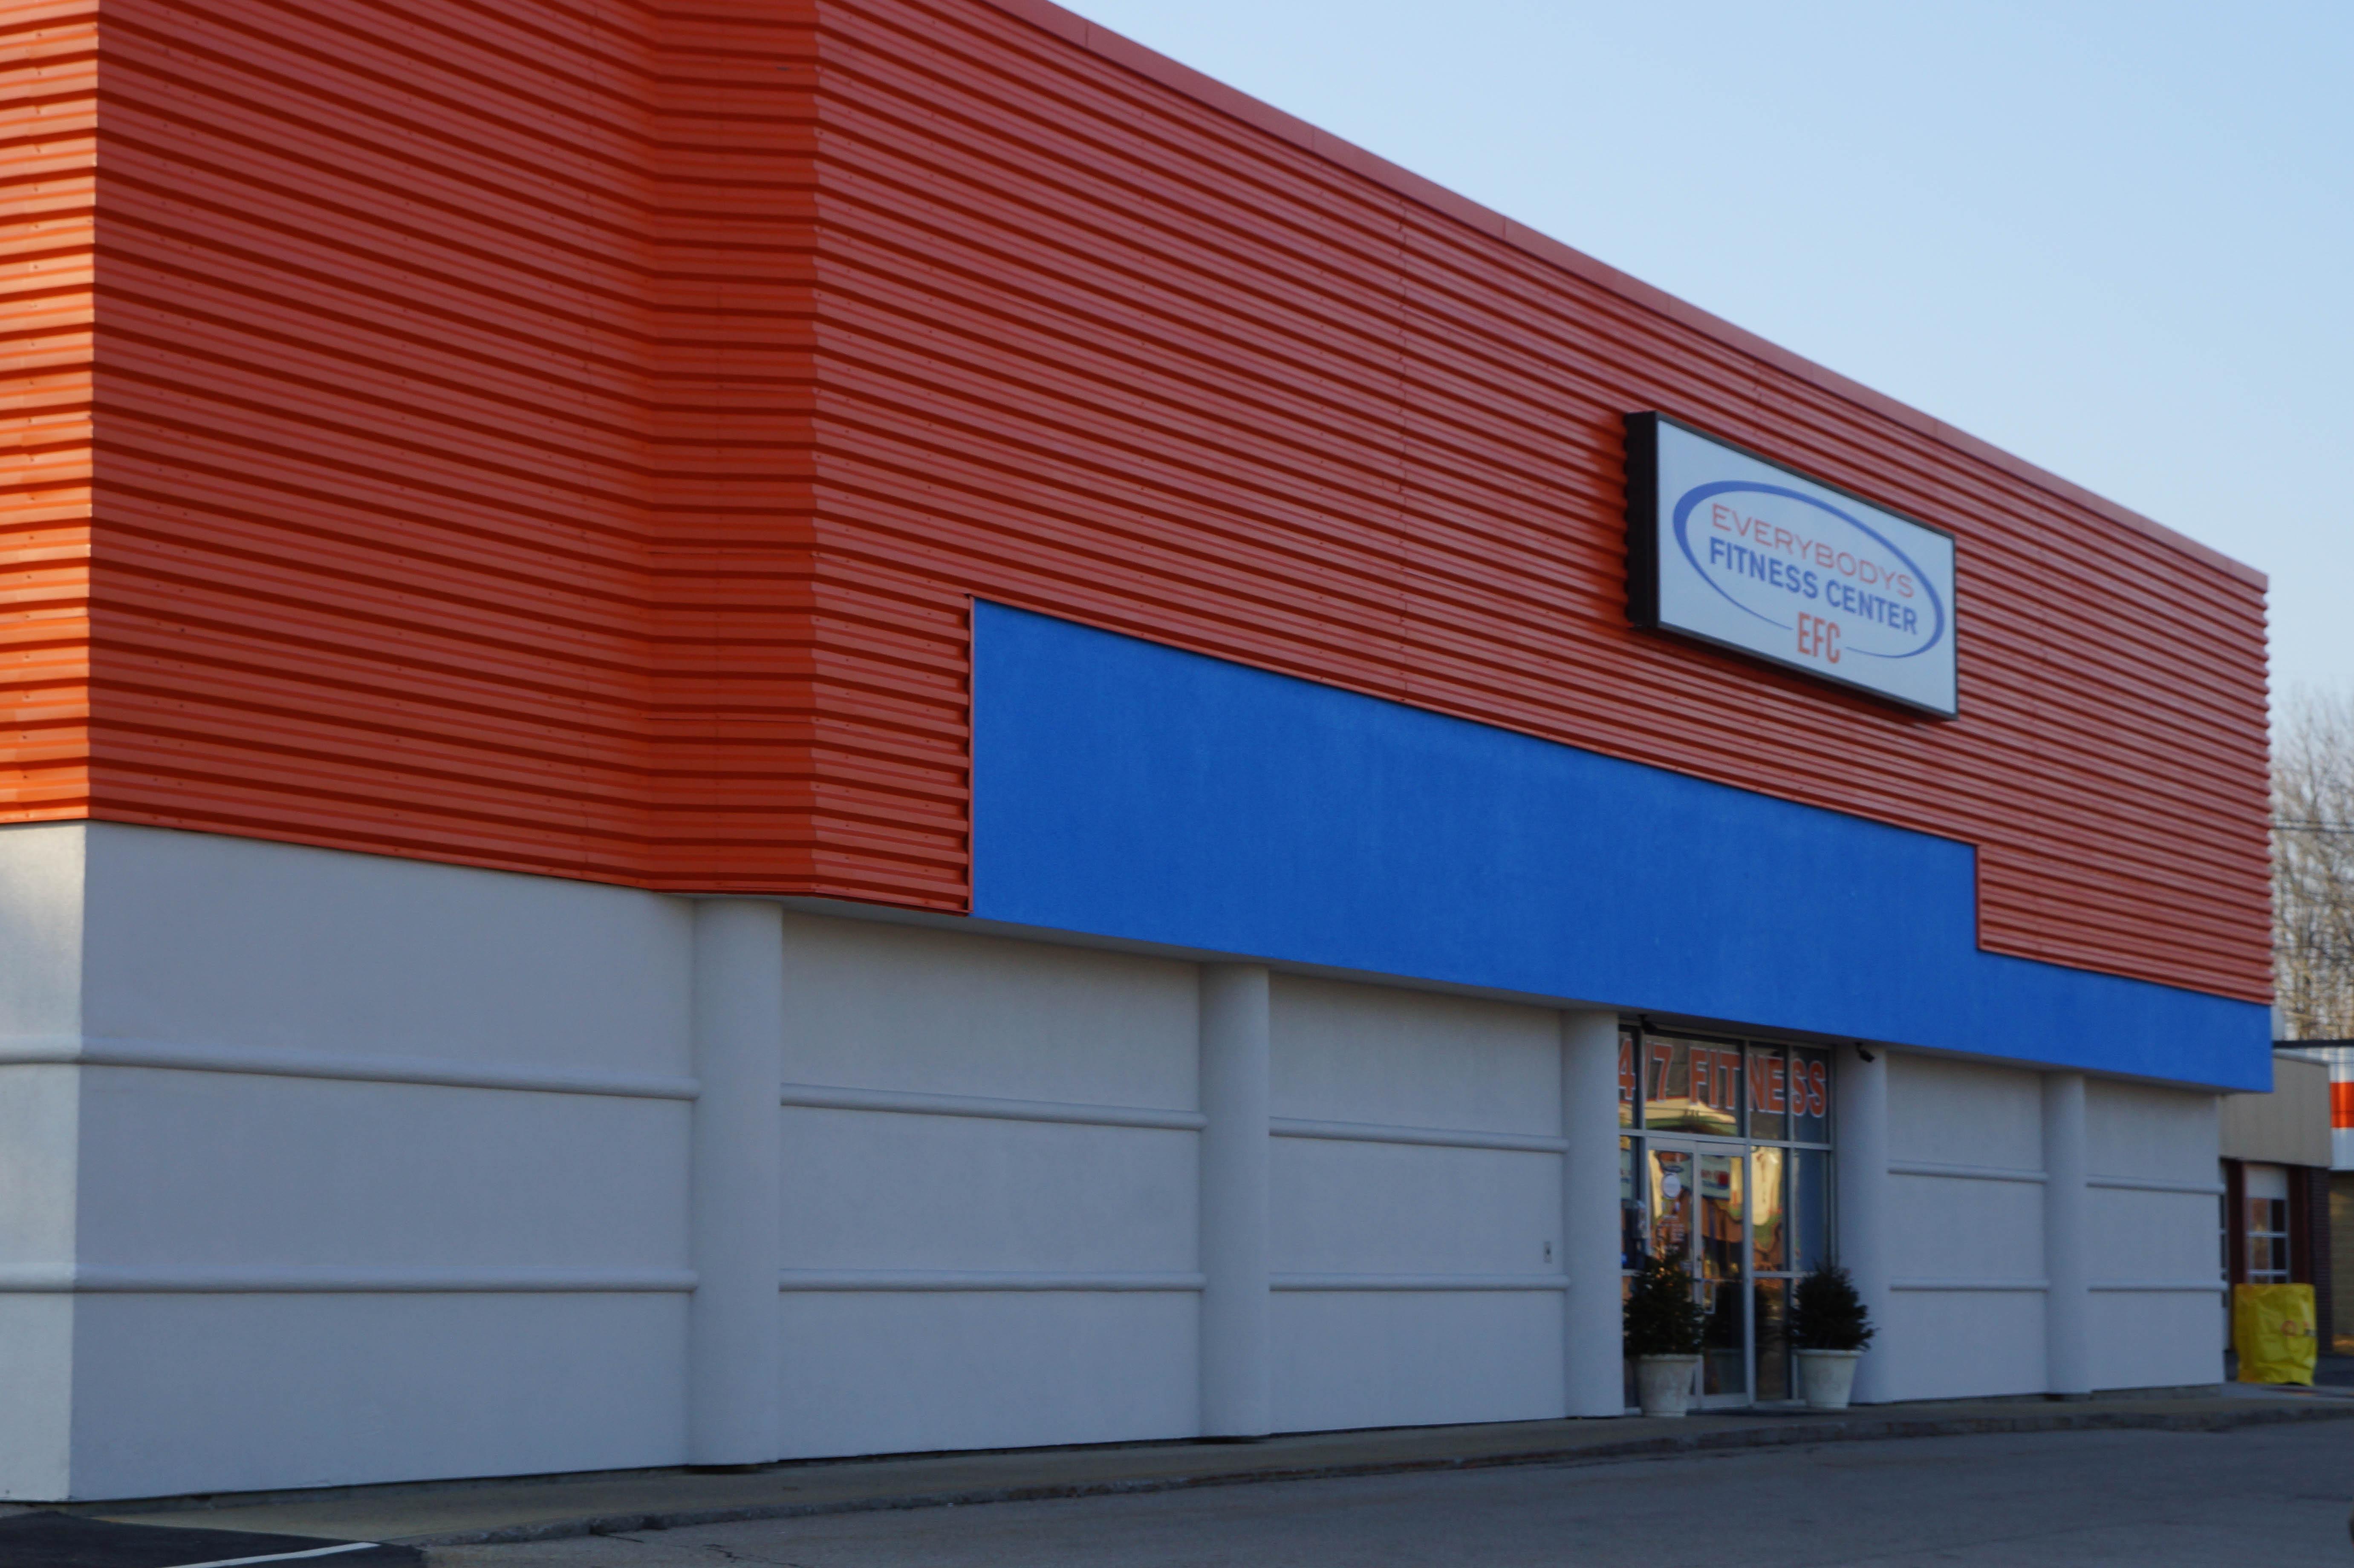 Everybodys Fitness Center image 8